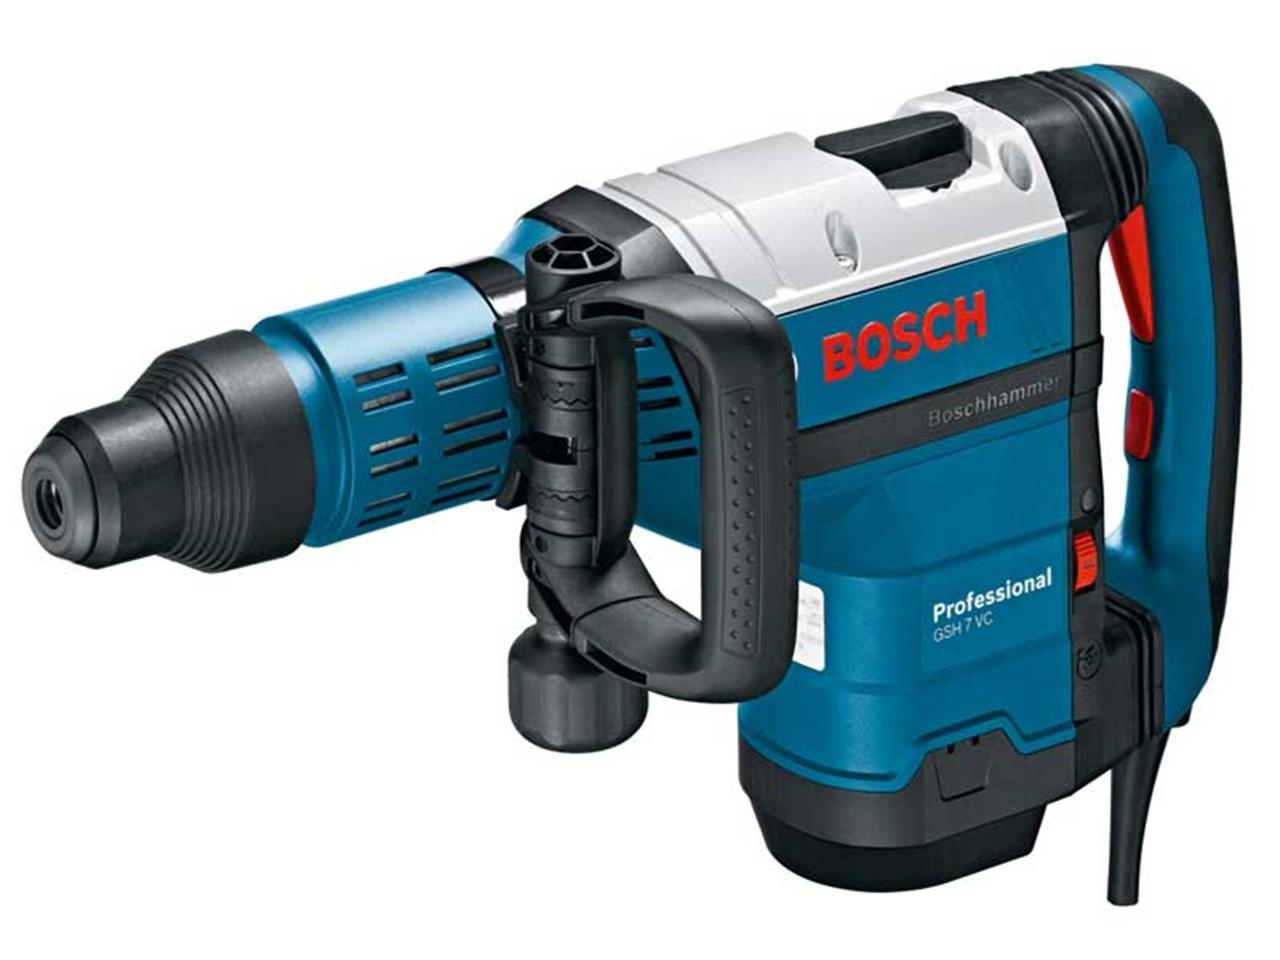 bosch gsh7vc 110v sds max demolition hammer drill. Black Bedroom Furniture Sets. Home Design Ideas